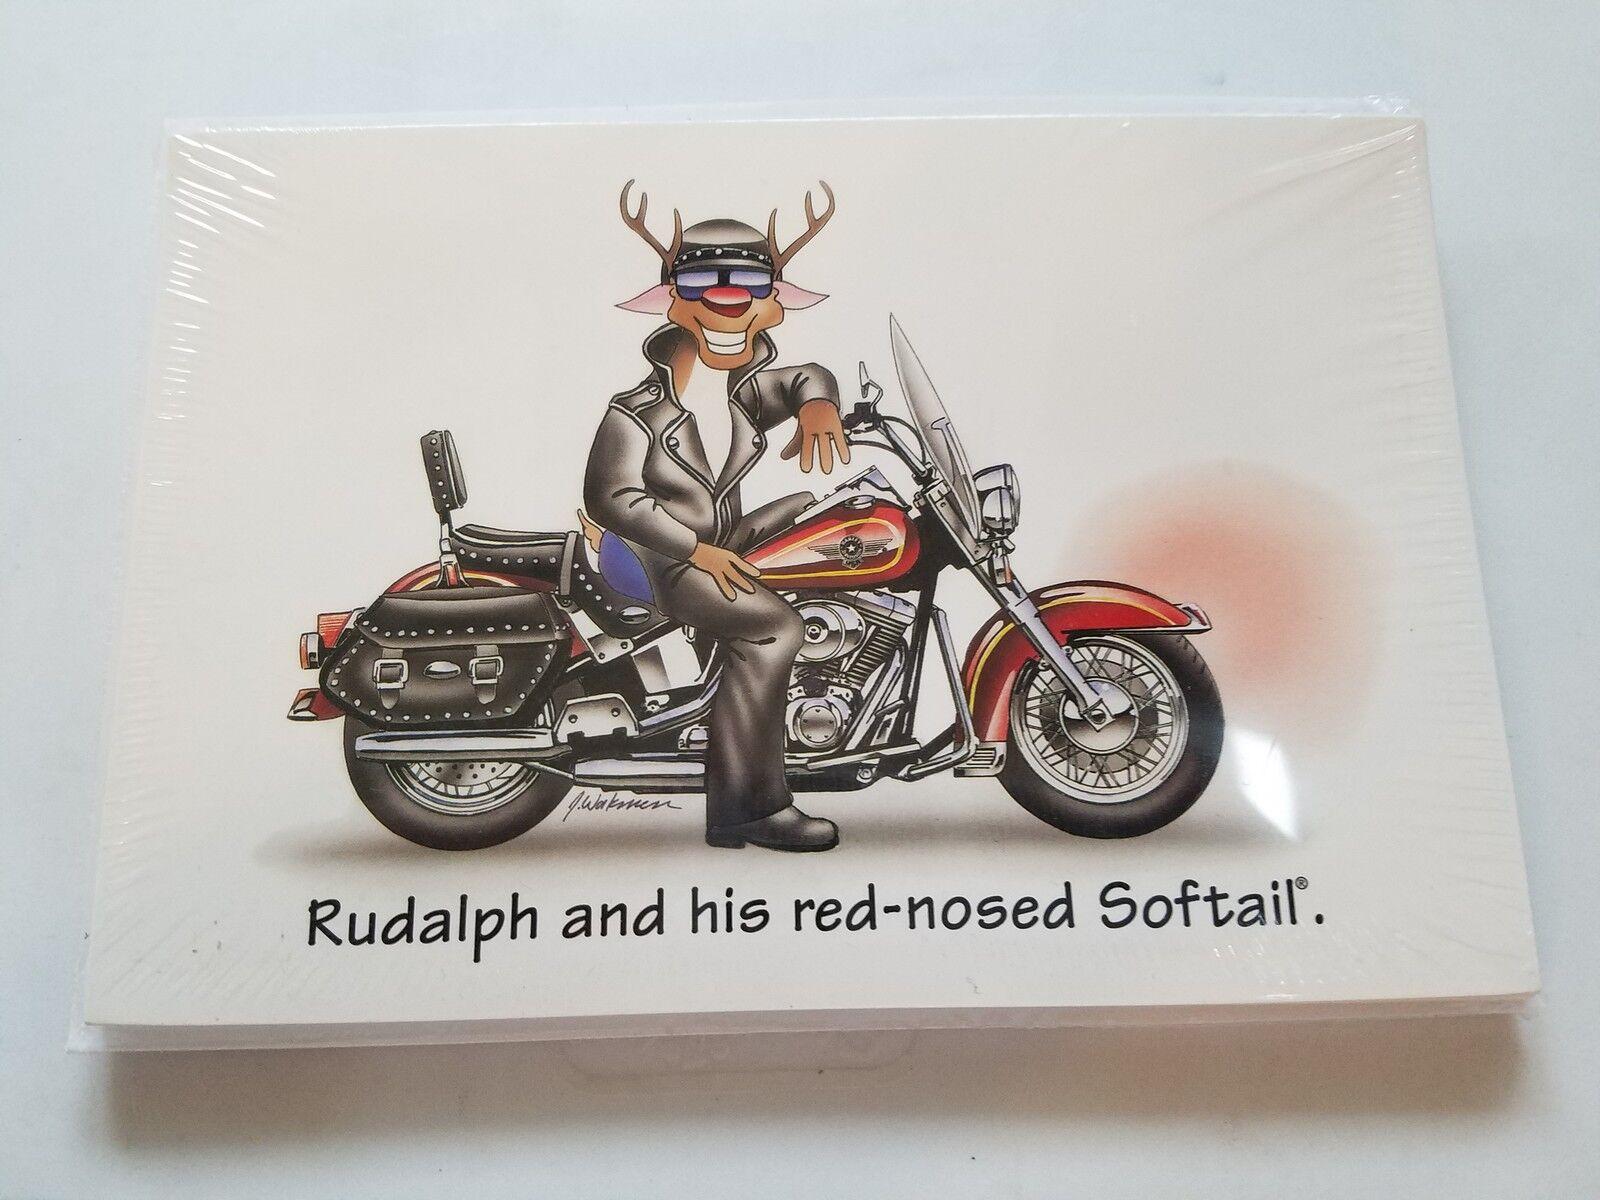 HARLEY DAVIDSON CHRISTMAS CARDS  X482 HARLEY RUDOLPH ON SOFTAIL HARLEY (100PK)